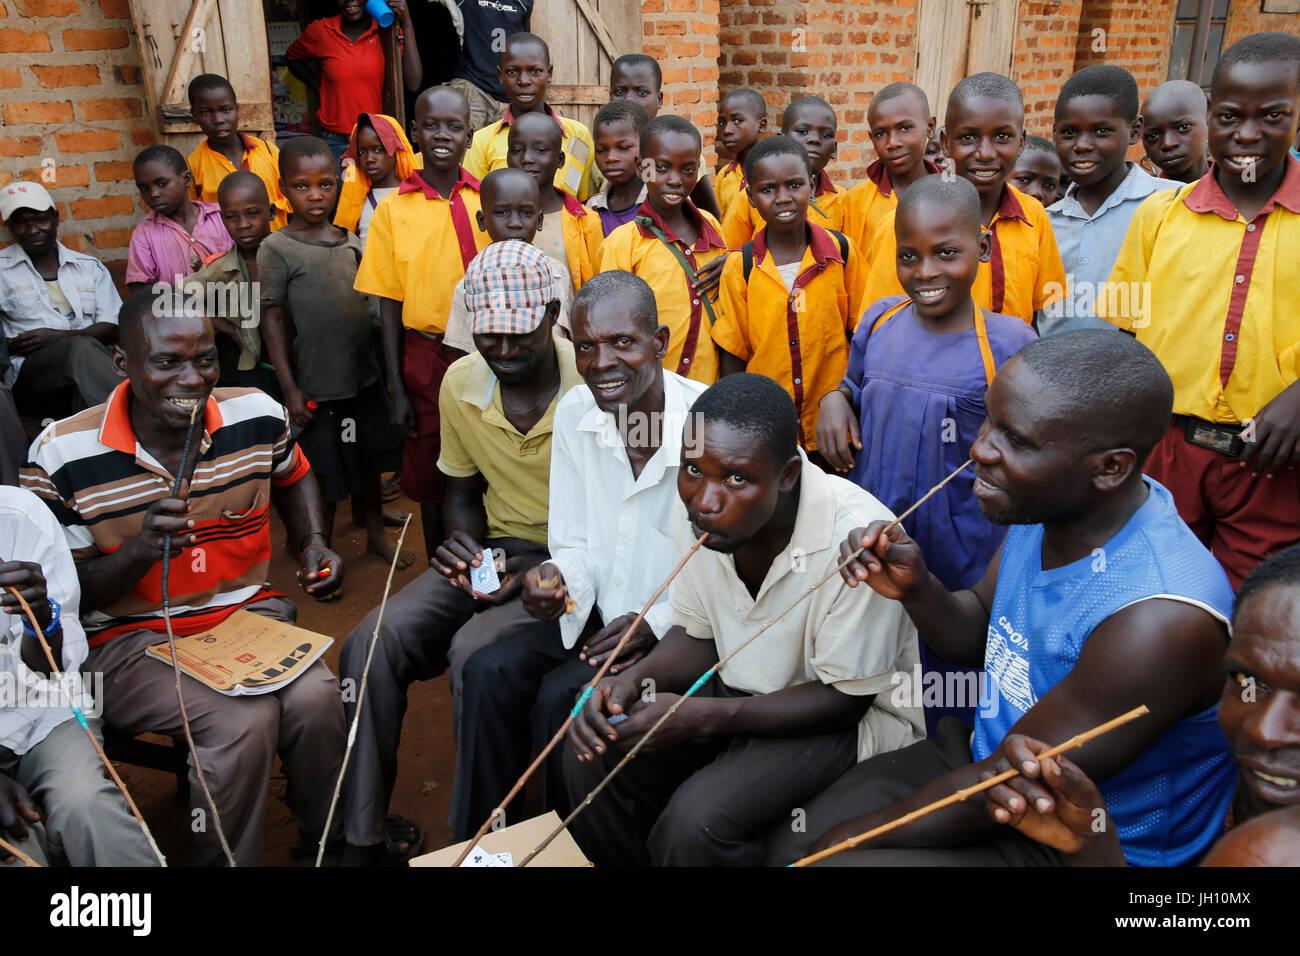 Ugandan villagers drinking home-brewed beer and schoolchildren. Uganda. - Stock Image